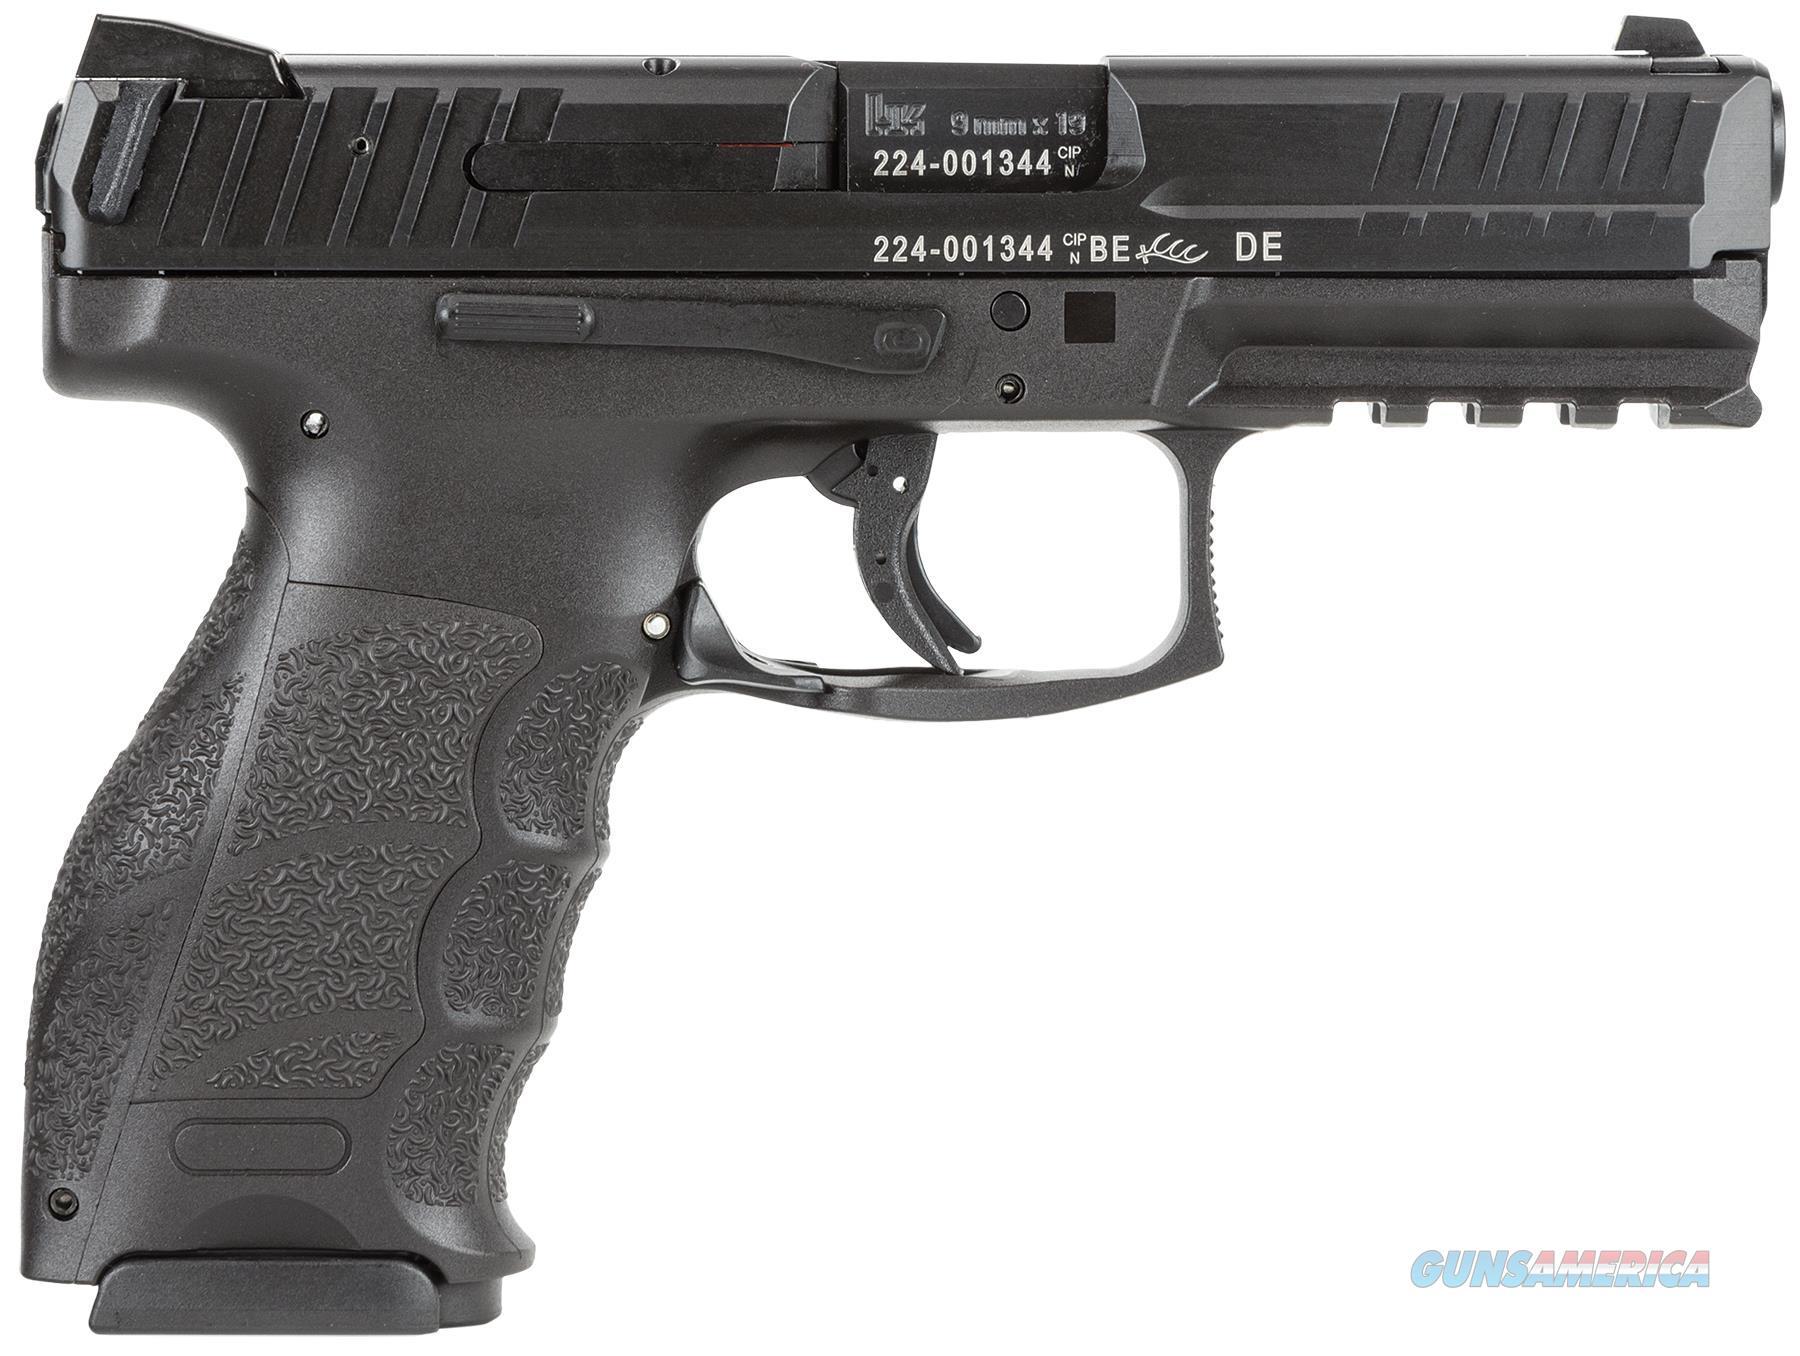 "Heckler & Koch 700009A5 Vp9 *Ma Compliant* Double 9Mm Luger 4.09"" 10+1 2 Mags Black Interchangeable Backstrap Grip Black 700009-A5  Guns > Pistols > H Misc Pistols"